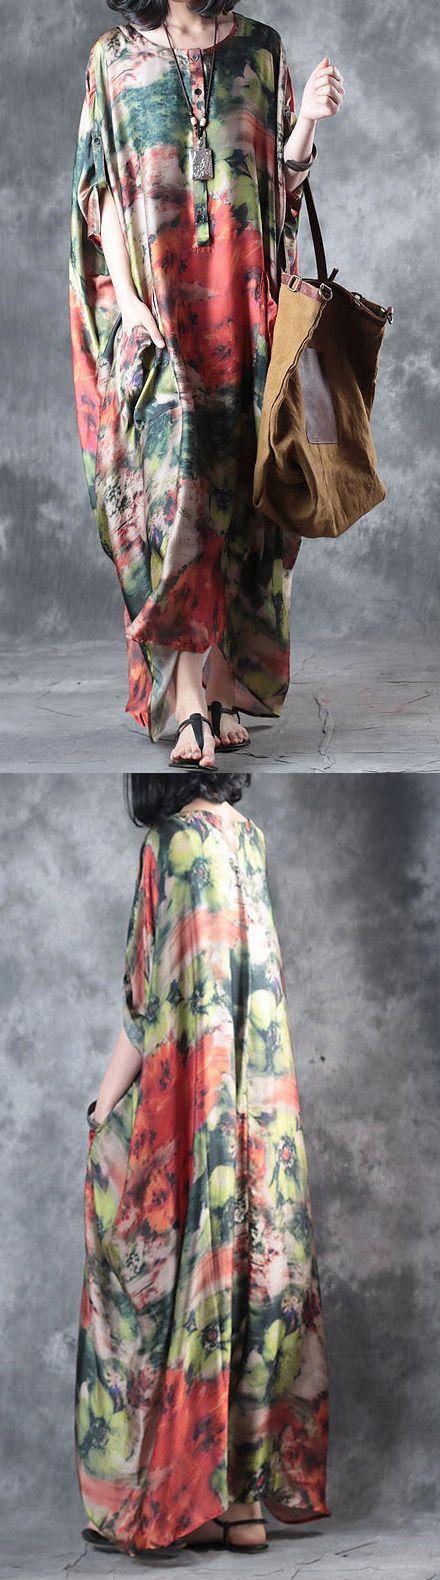 baggy multi vintage silk dresses plus size casual sundress batwing sleeve maxi dress